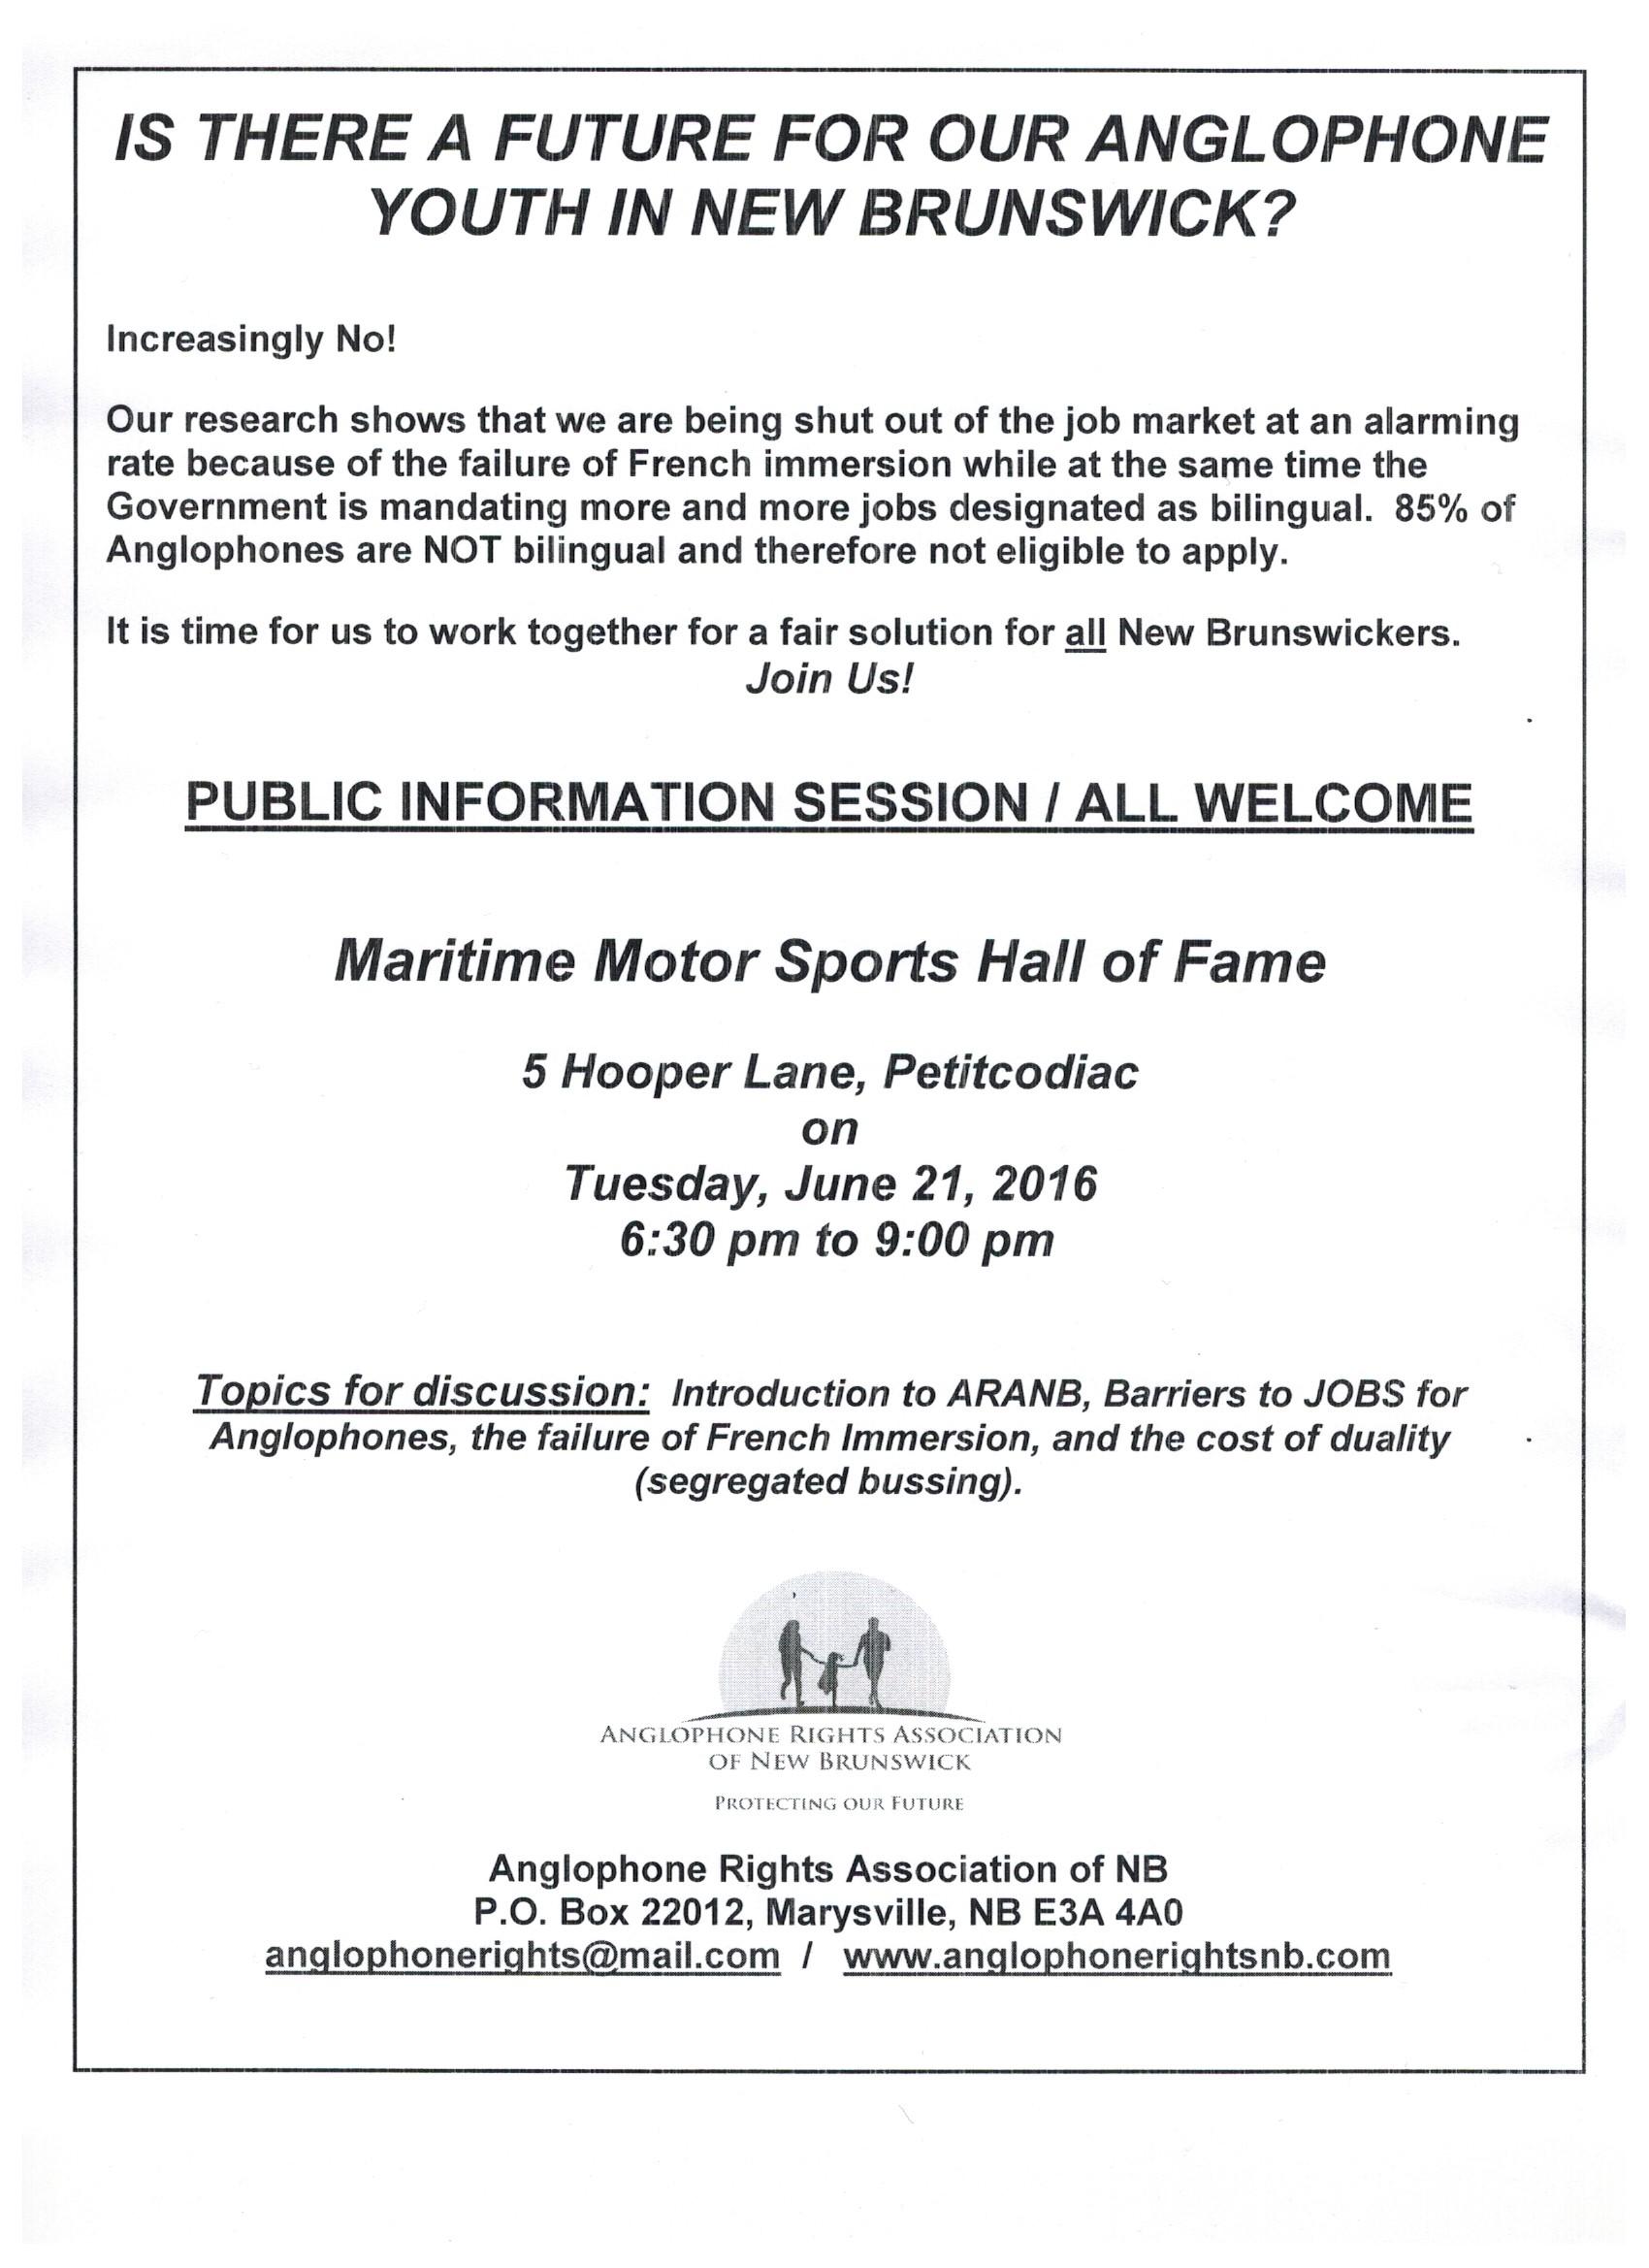 Petitcodiac Poster in jpg - June 21 2016  - community meeting